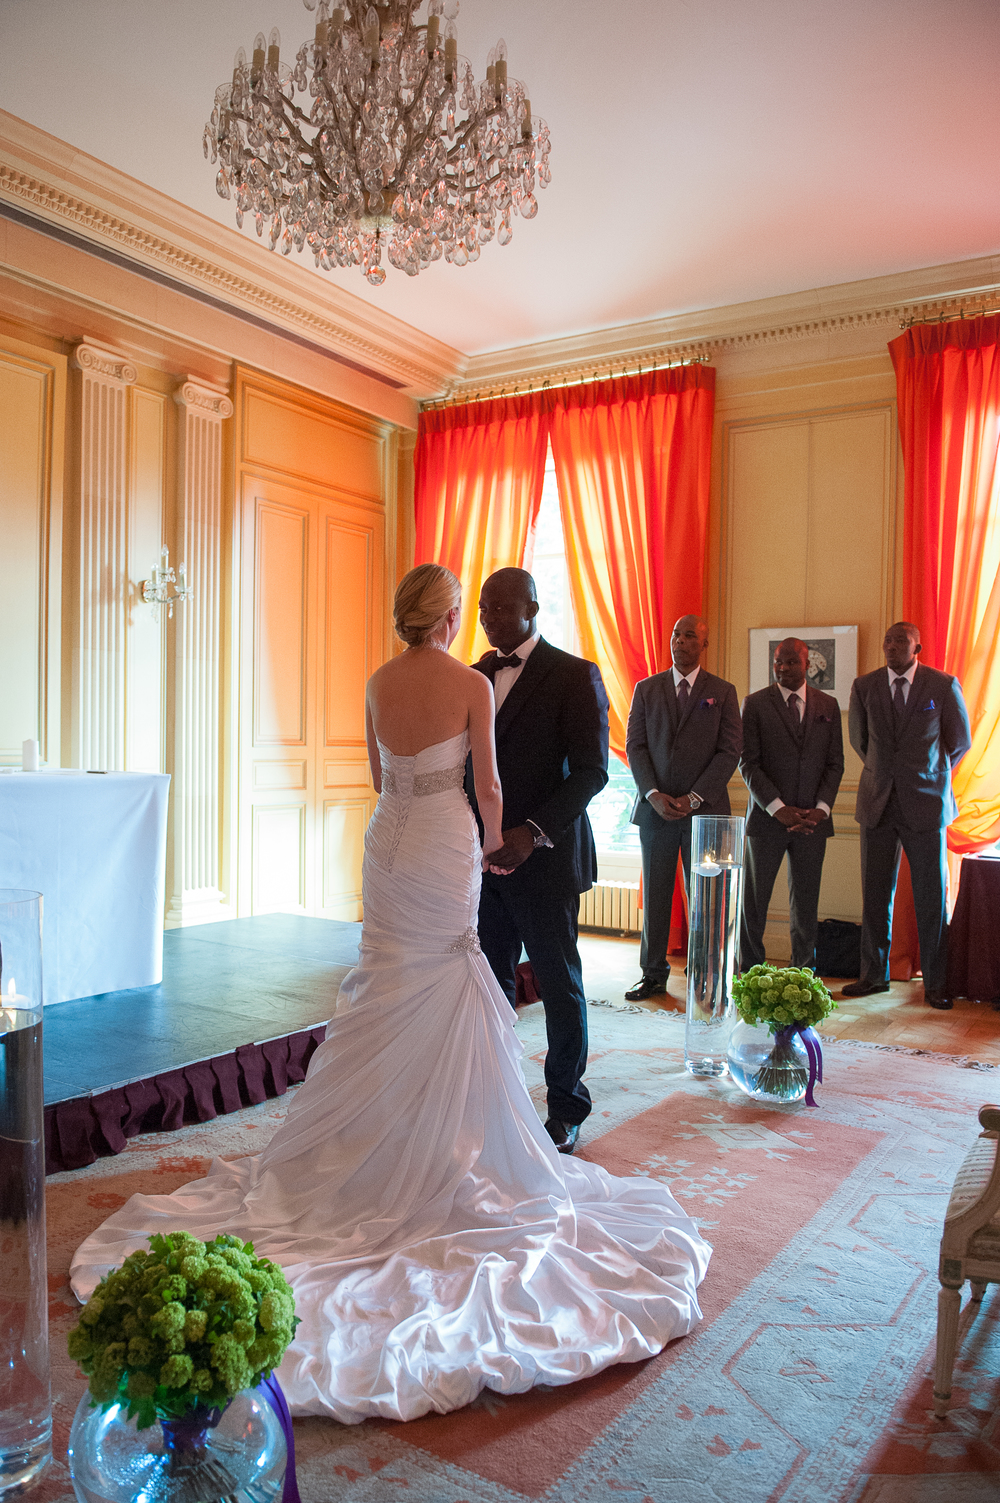 paris wedding 7.jpg